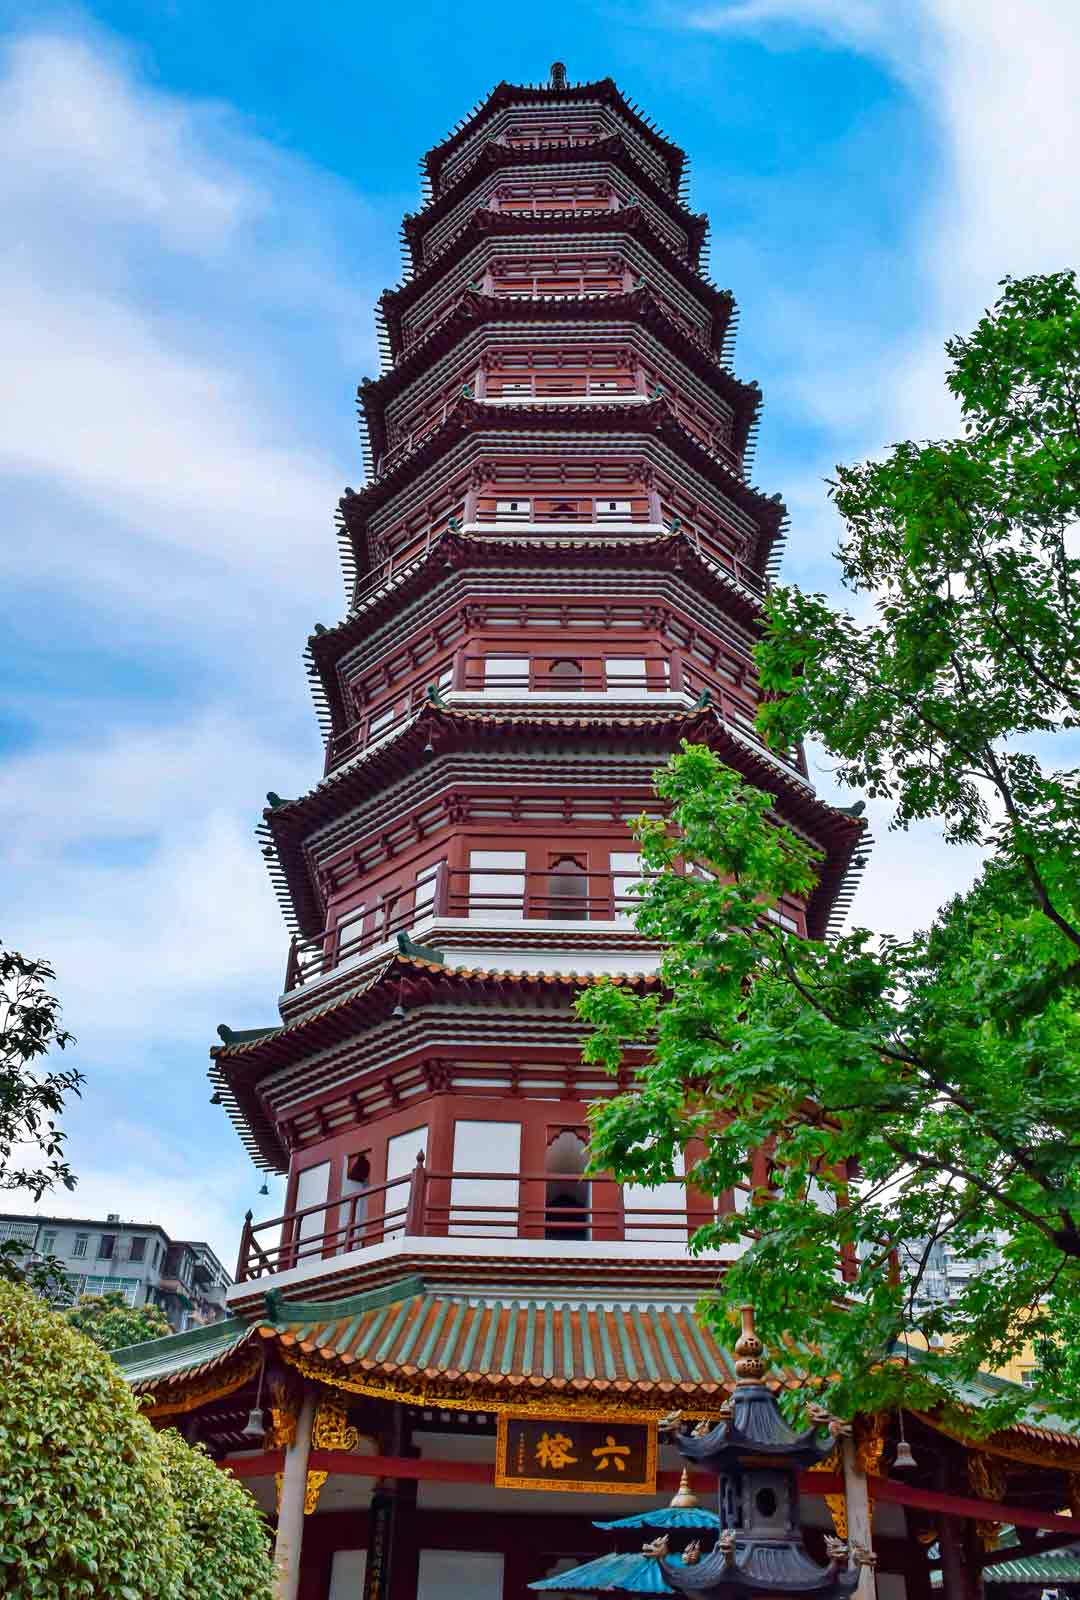 Liu Rong -temppelin Six Banyan Pagoda kohoaa miltei 60 metrin korkeuteen.